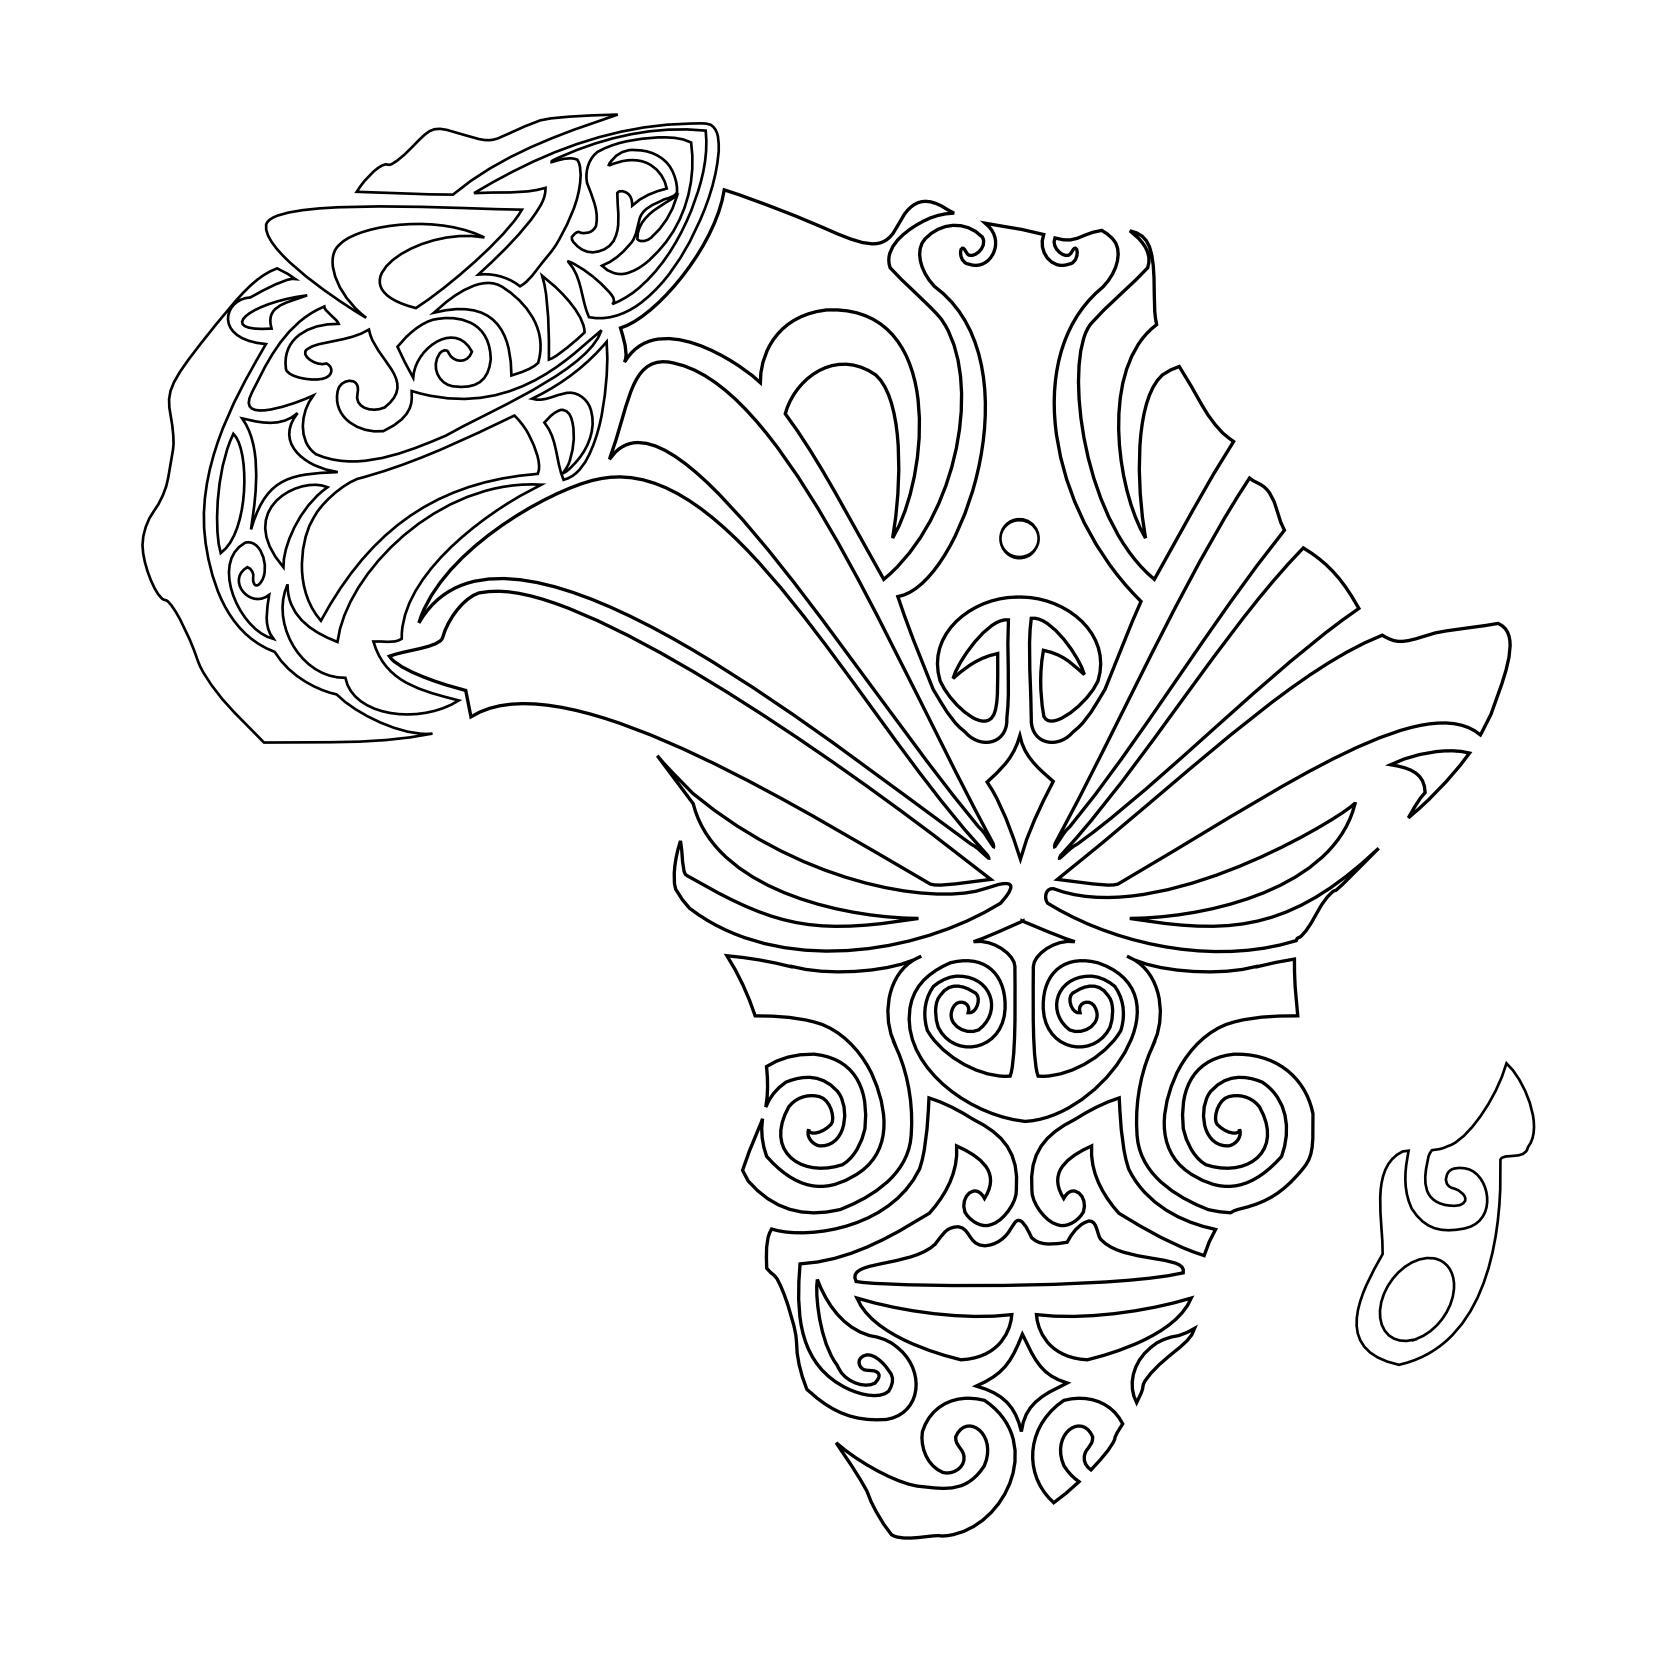 1653x1653 Best African Map Tattoo Design Eyal Map Tattoos